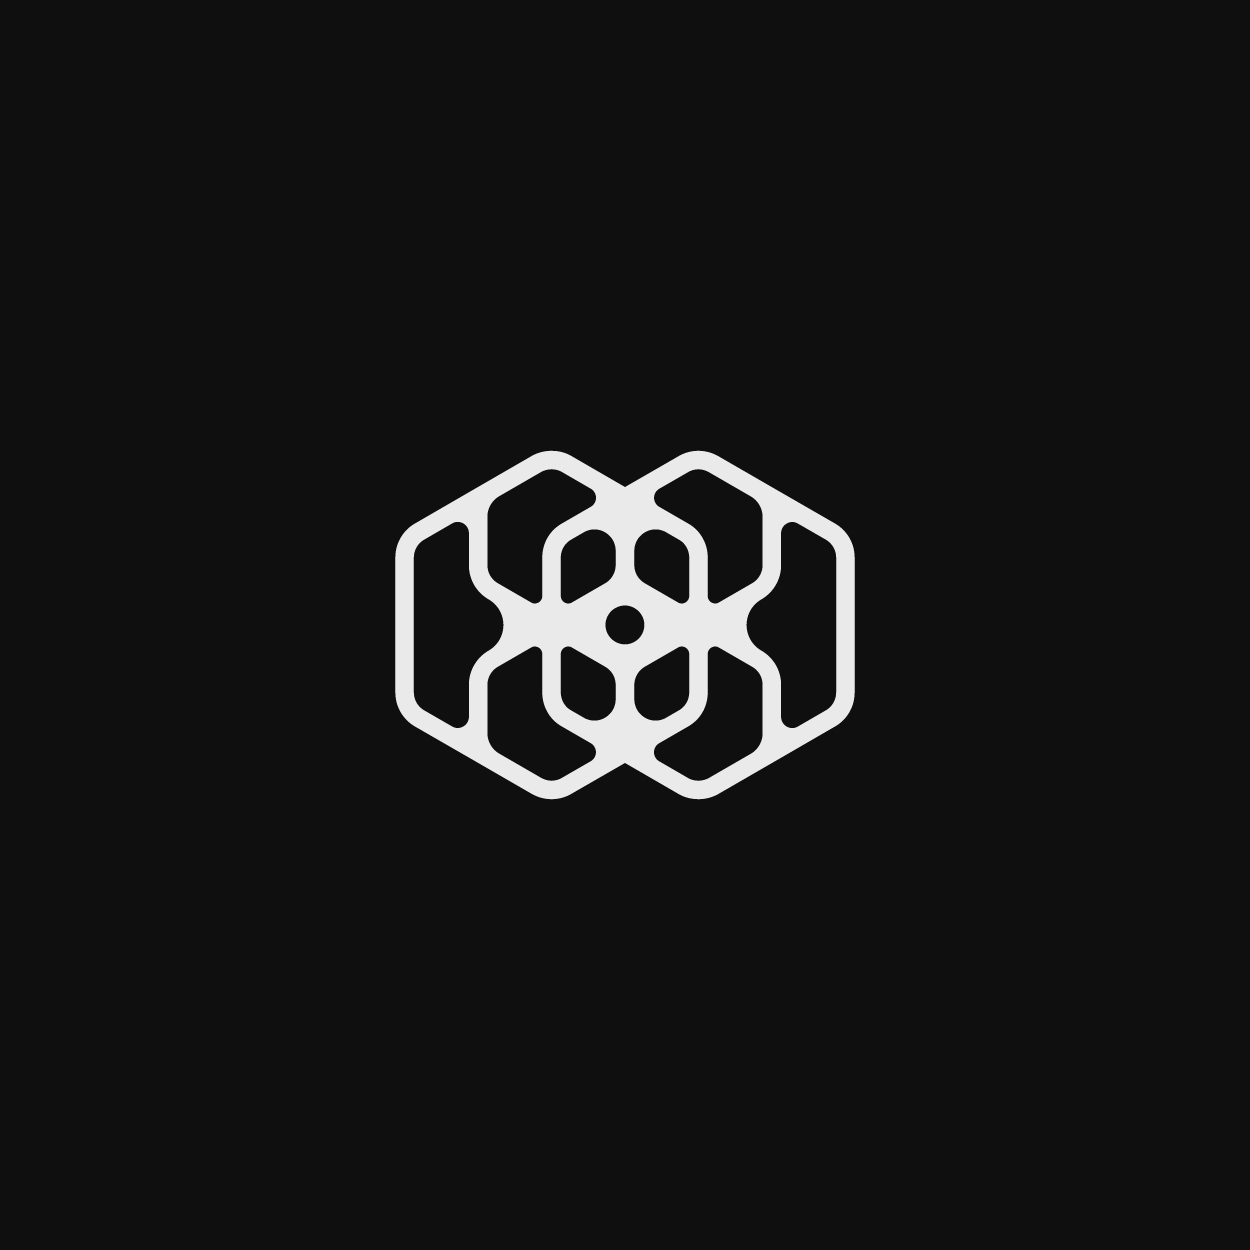 Sylvan_Logofolio2019_Artboard 124 copy1250.jpg